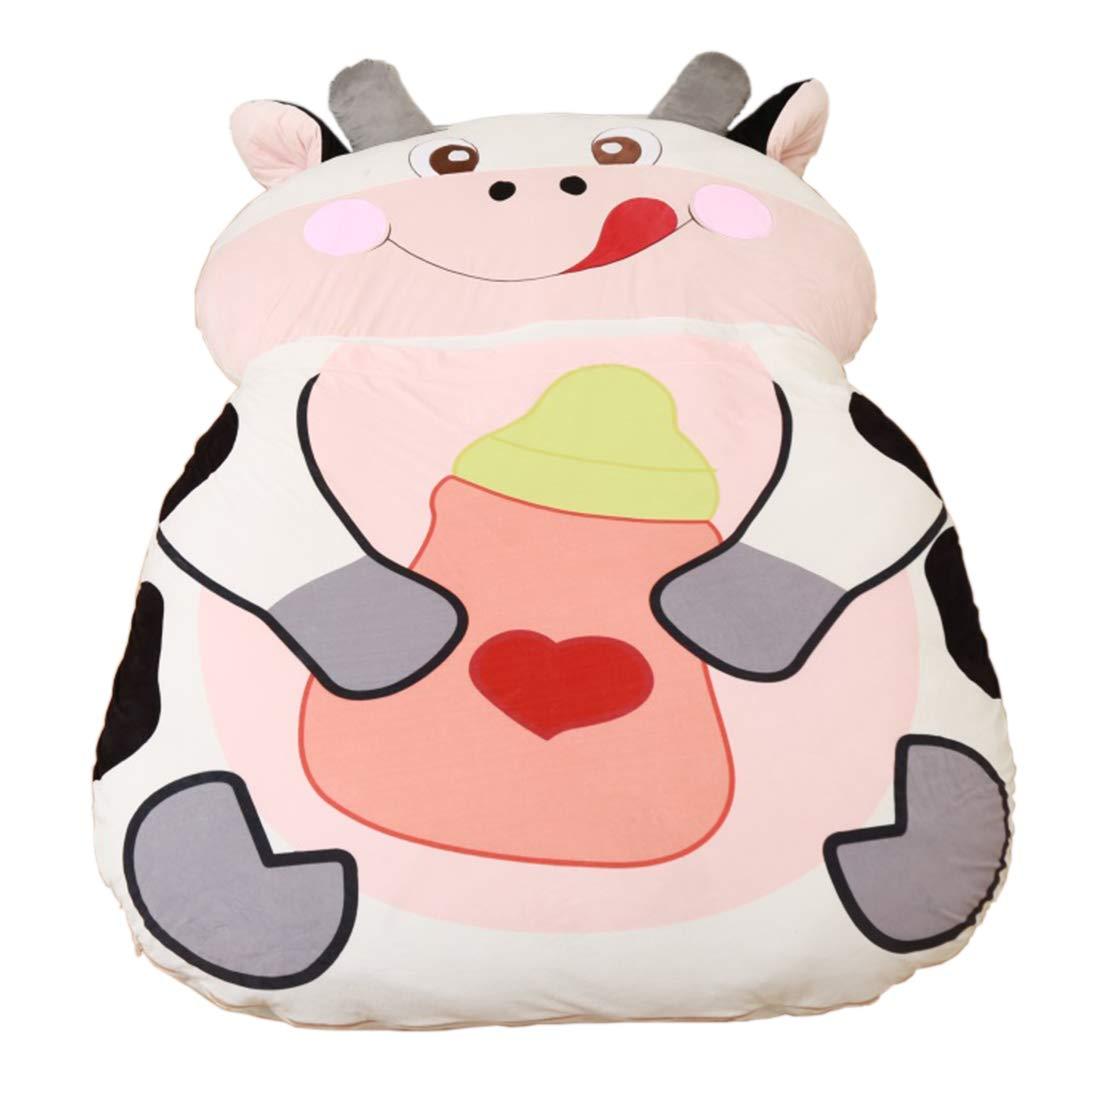 Alkem Christmas Cartoon Cow Bed Double Bean Bag Soft Mattress for Children by Alkem (Image #1)